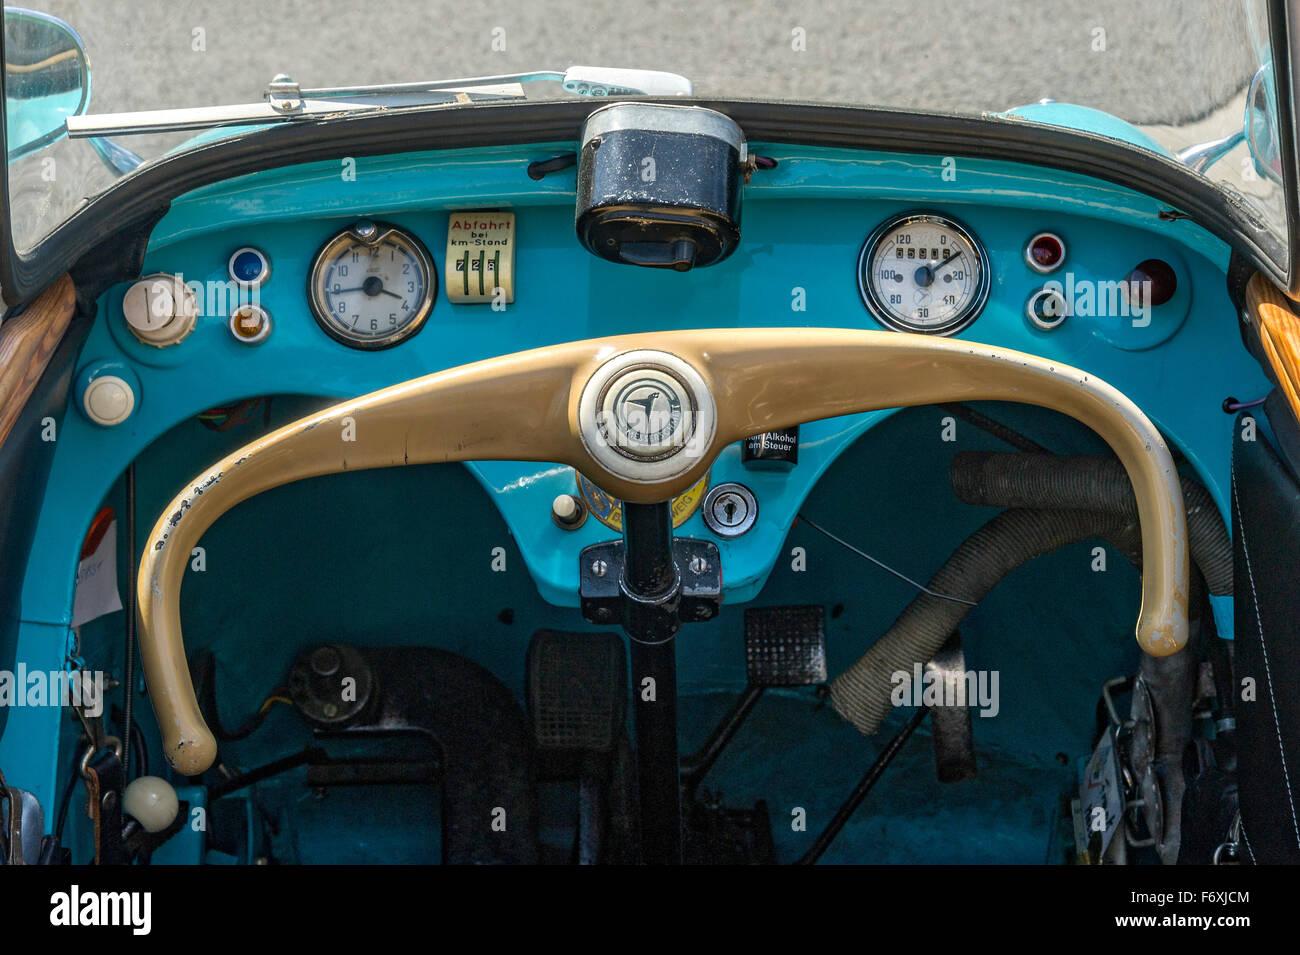 Armaturenbrett oldtimer  Oldtimer-Treffen, Oldtimer Messerschmitt KR 200, Baujahr 1955-1964 ...